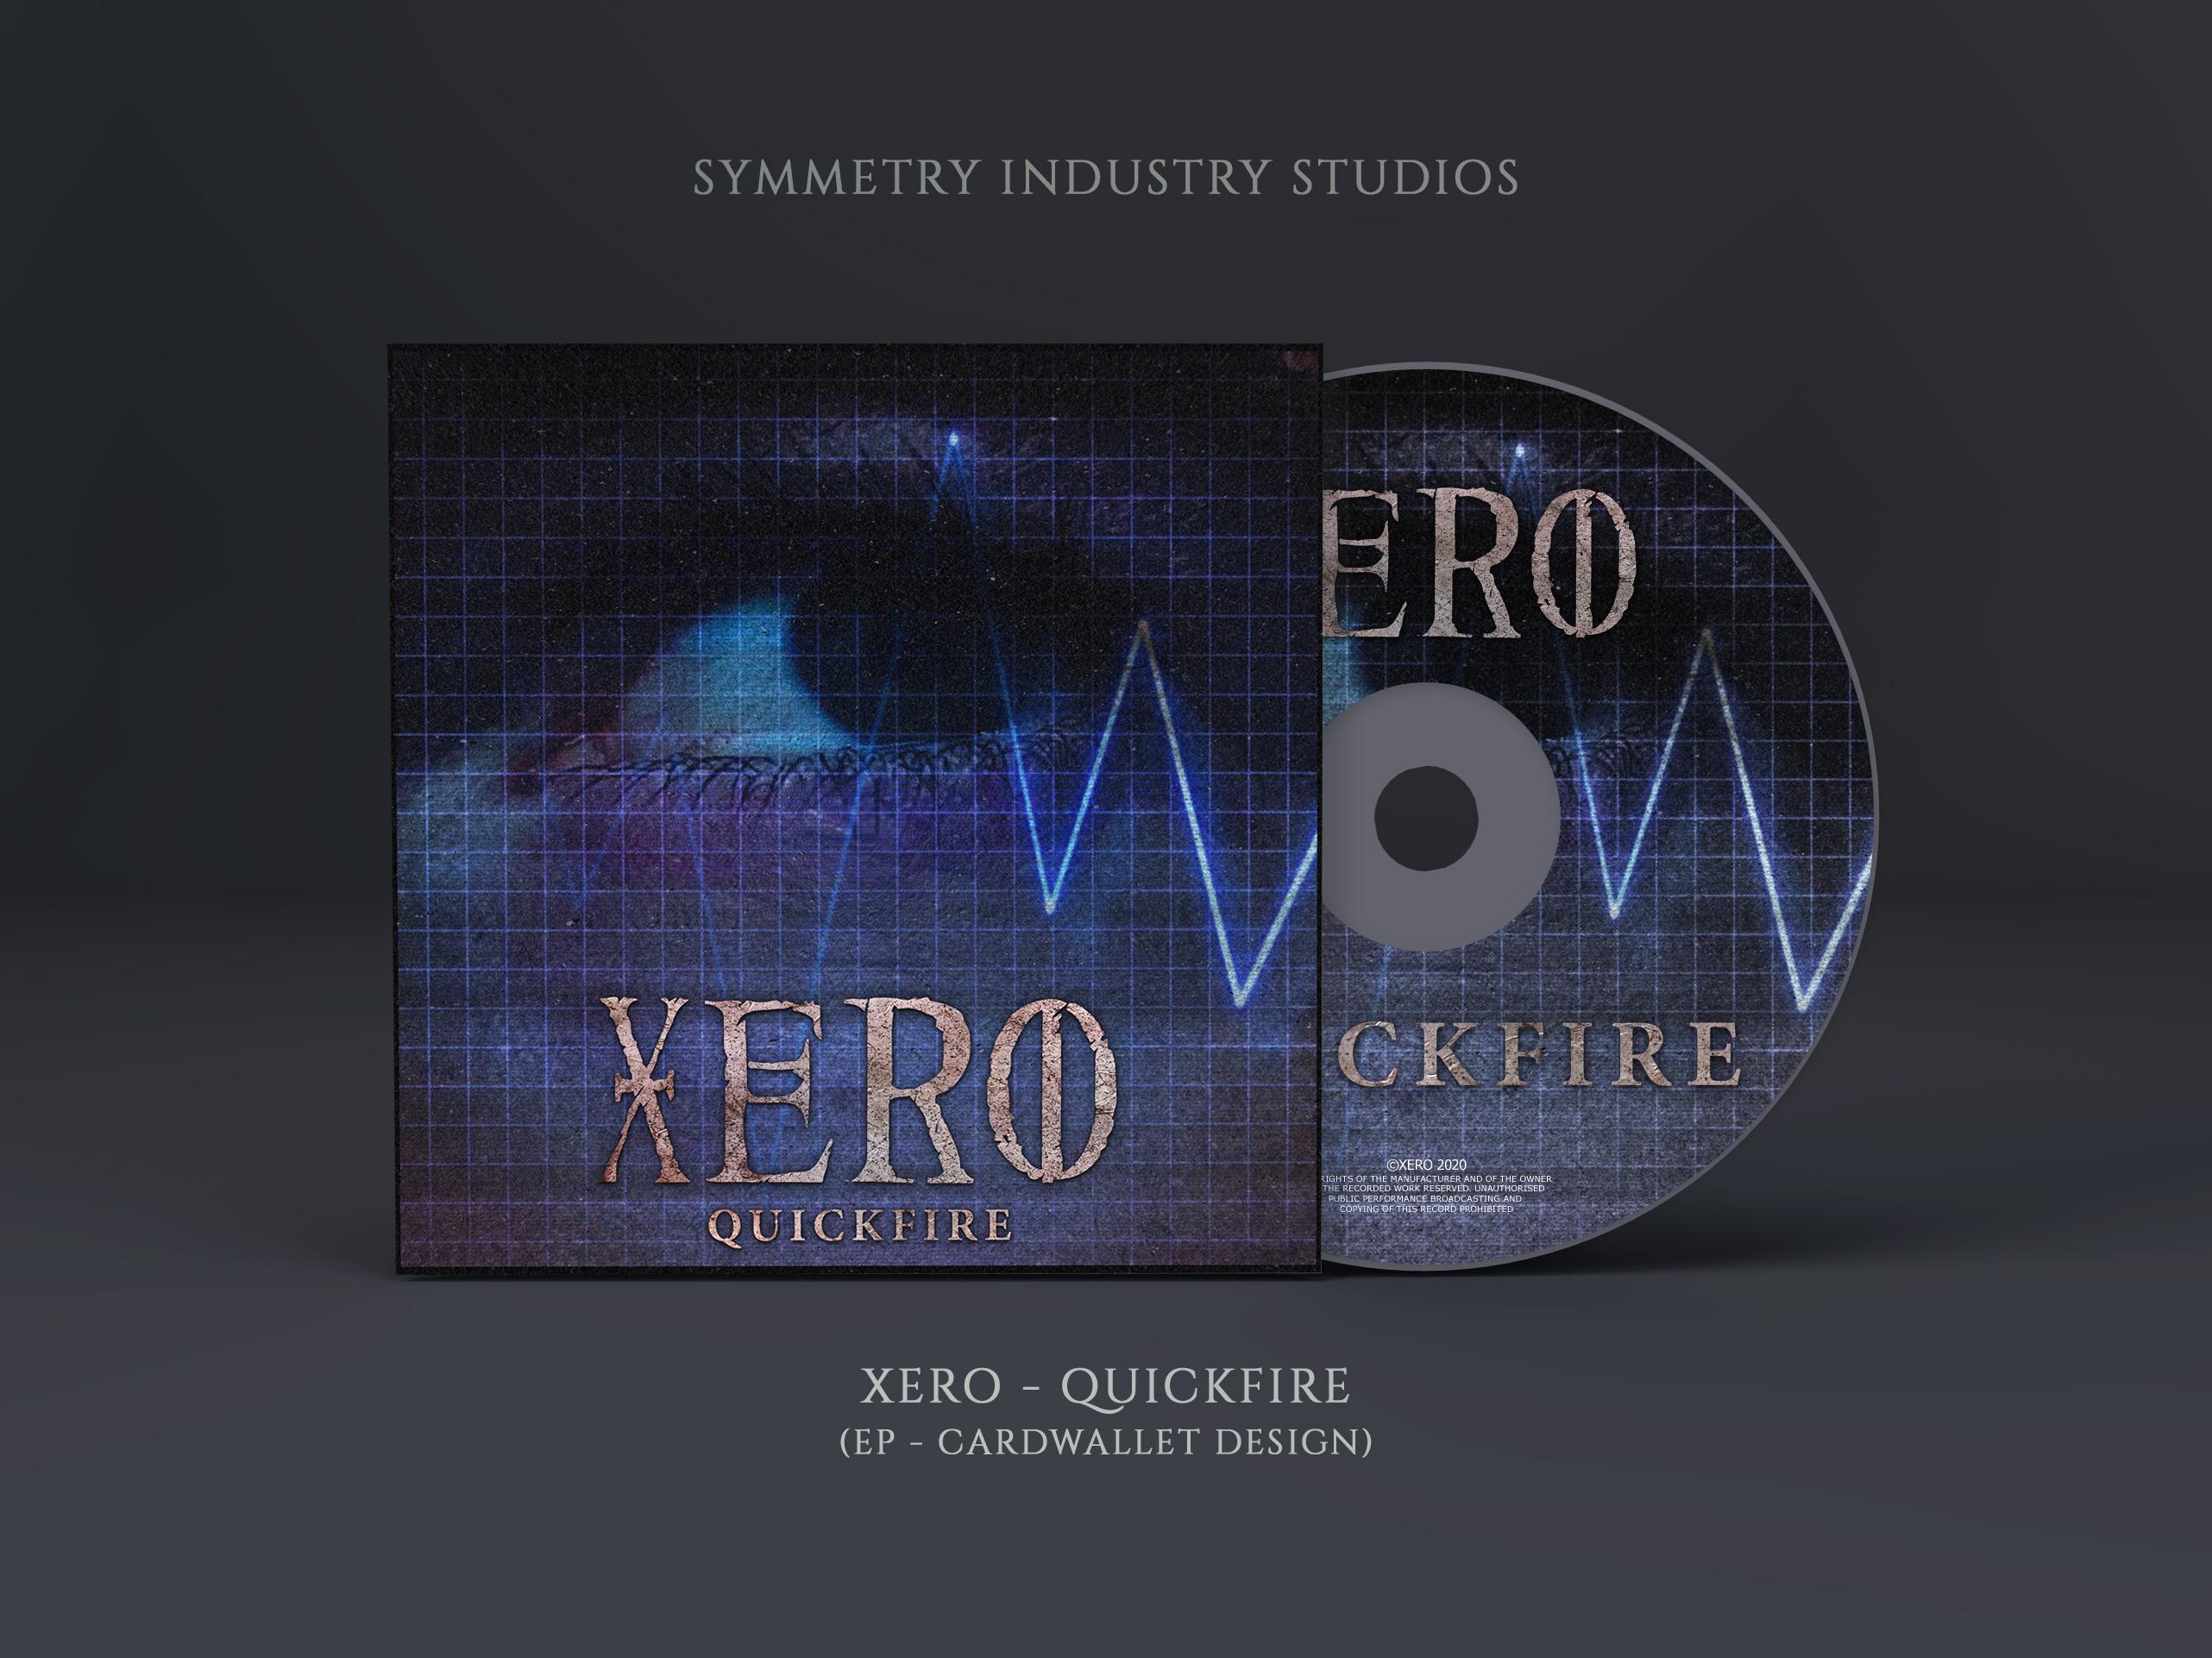 Xero - Quickfire (Mockup)